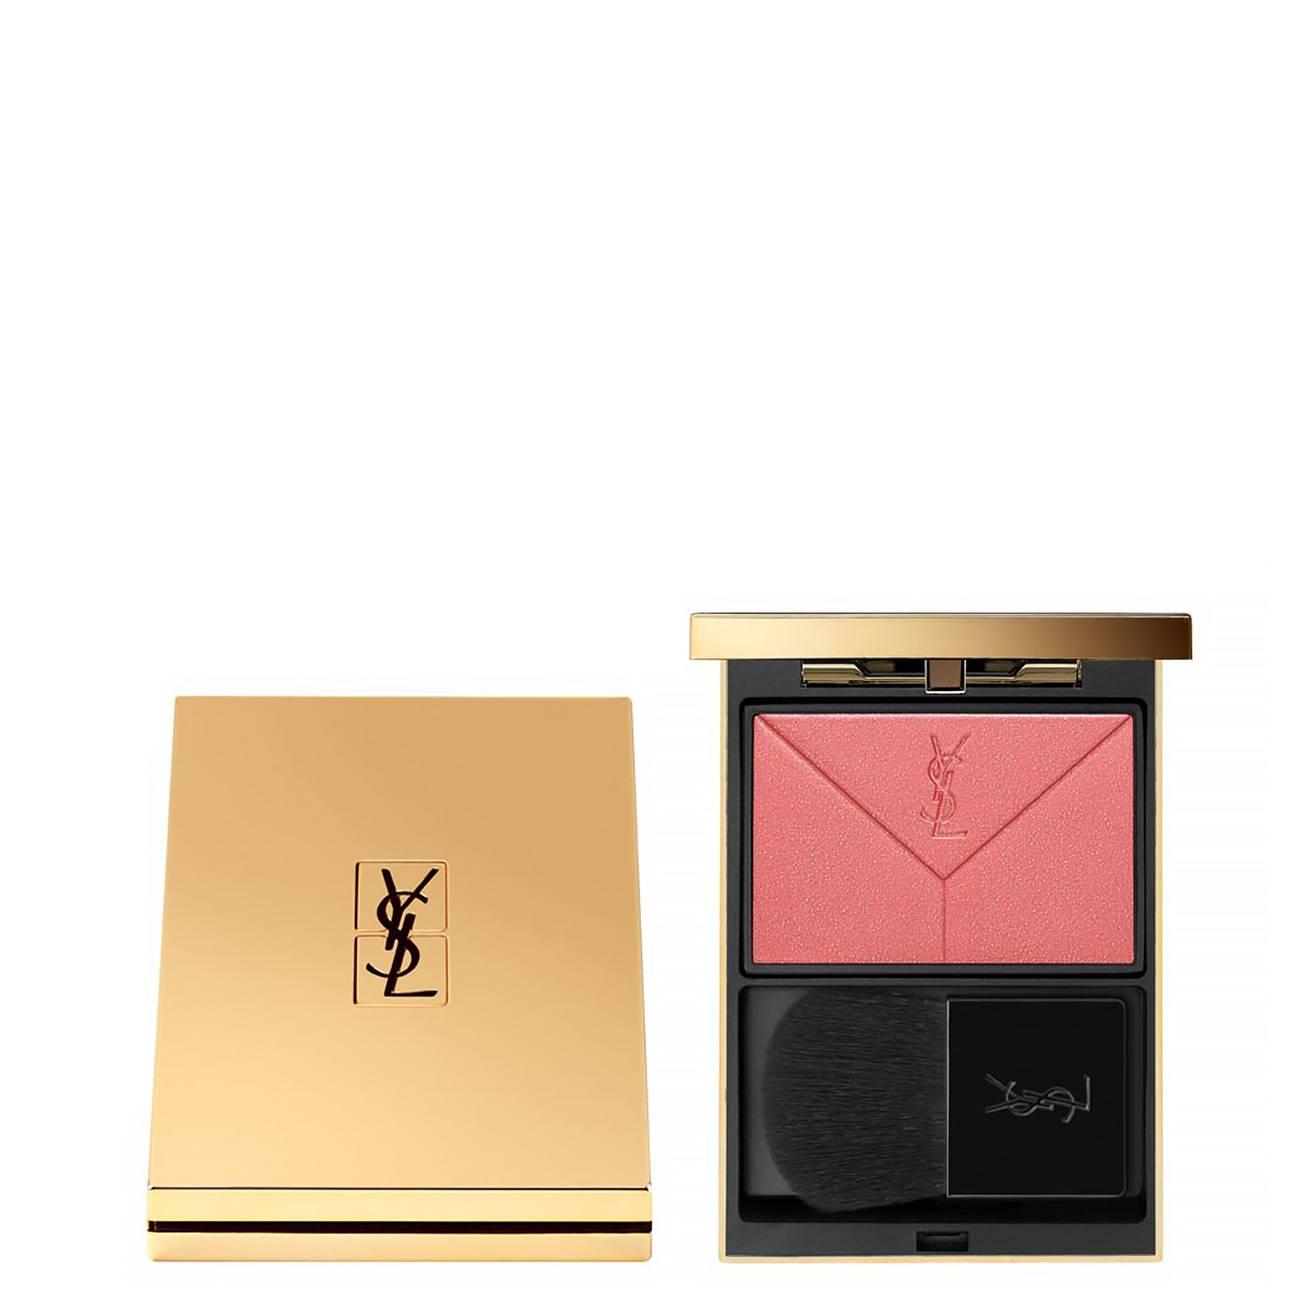 Couture Blush 6 3gr Yves Saint Laurent imagine 2021 bestvalue.eu